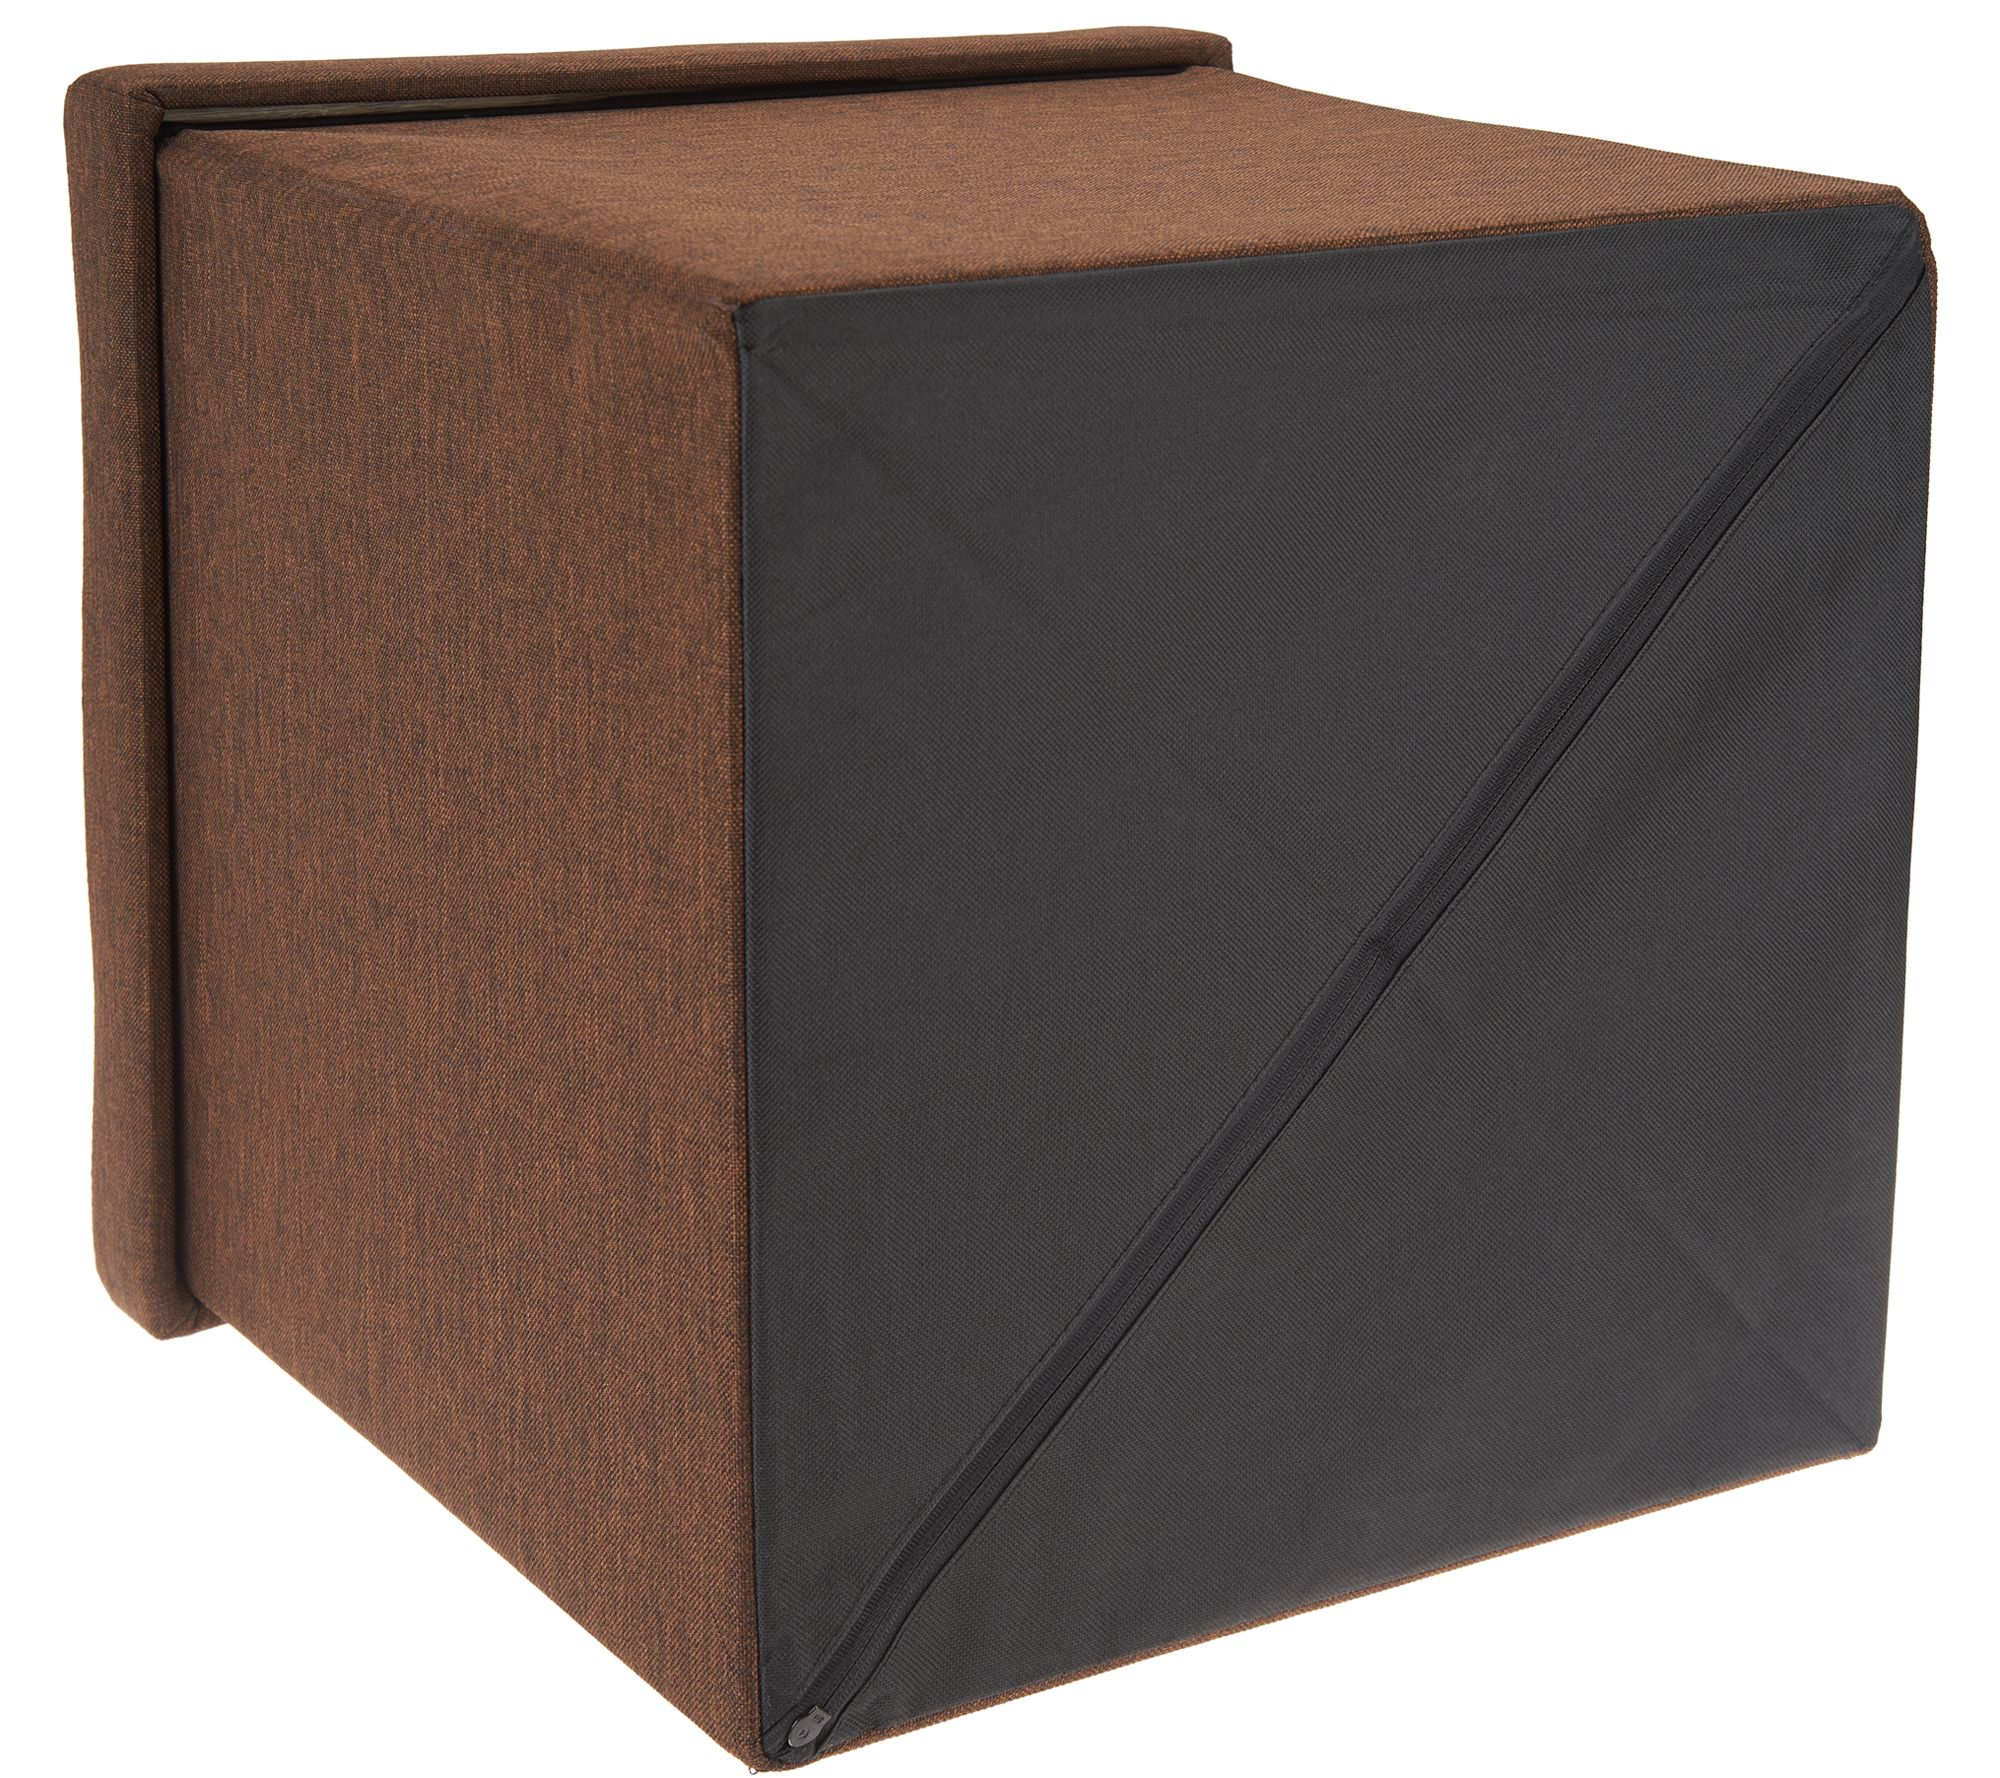 Super Fresh Home Elements Tufted Set Of 2 15 Folding Ottomans W Tray Qvc Com Ibusinesslaw Wood Chair Design Ideas Ibusinesslaworg